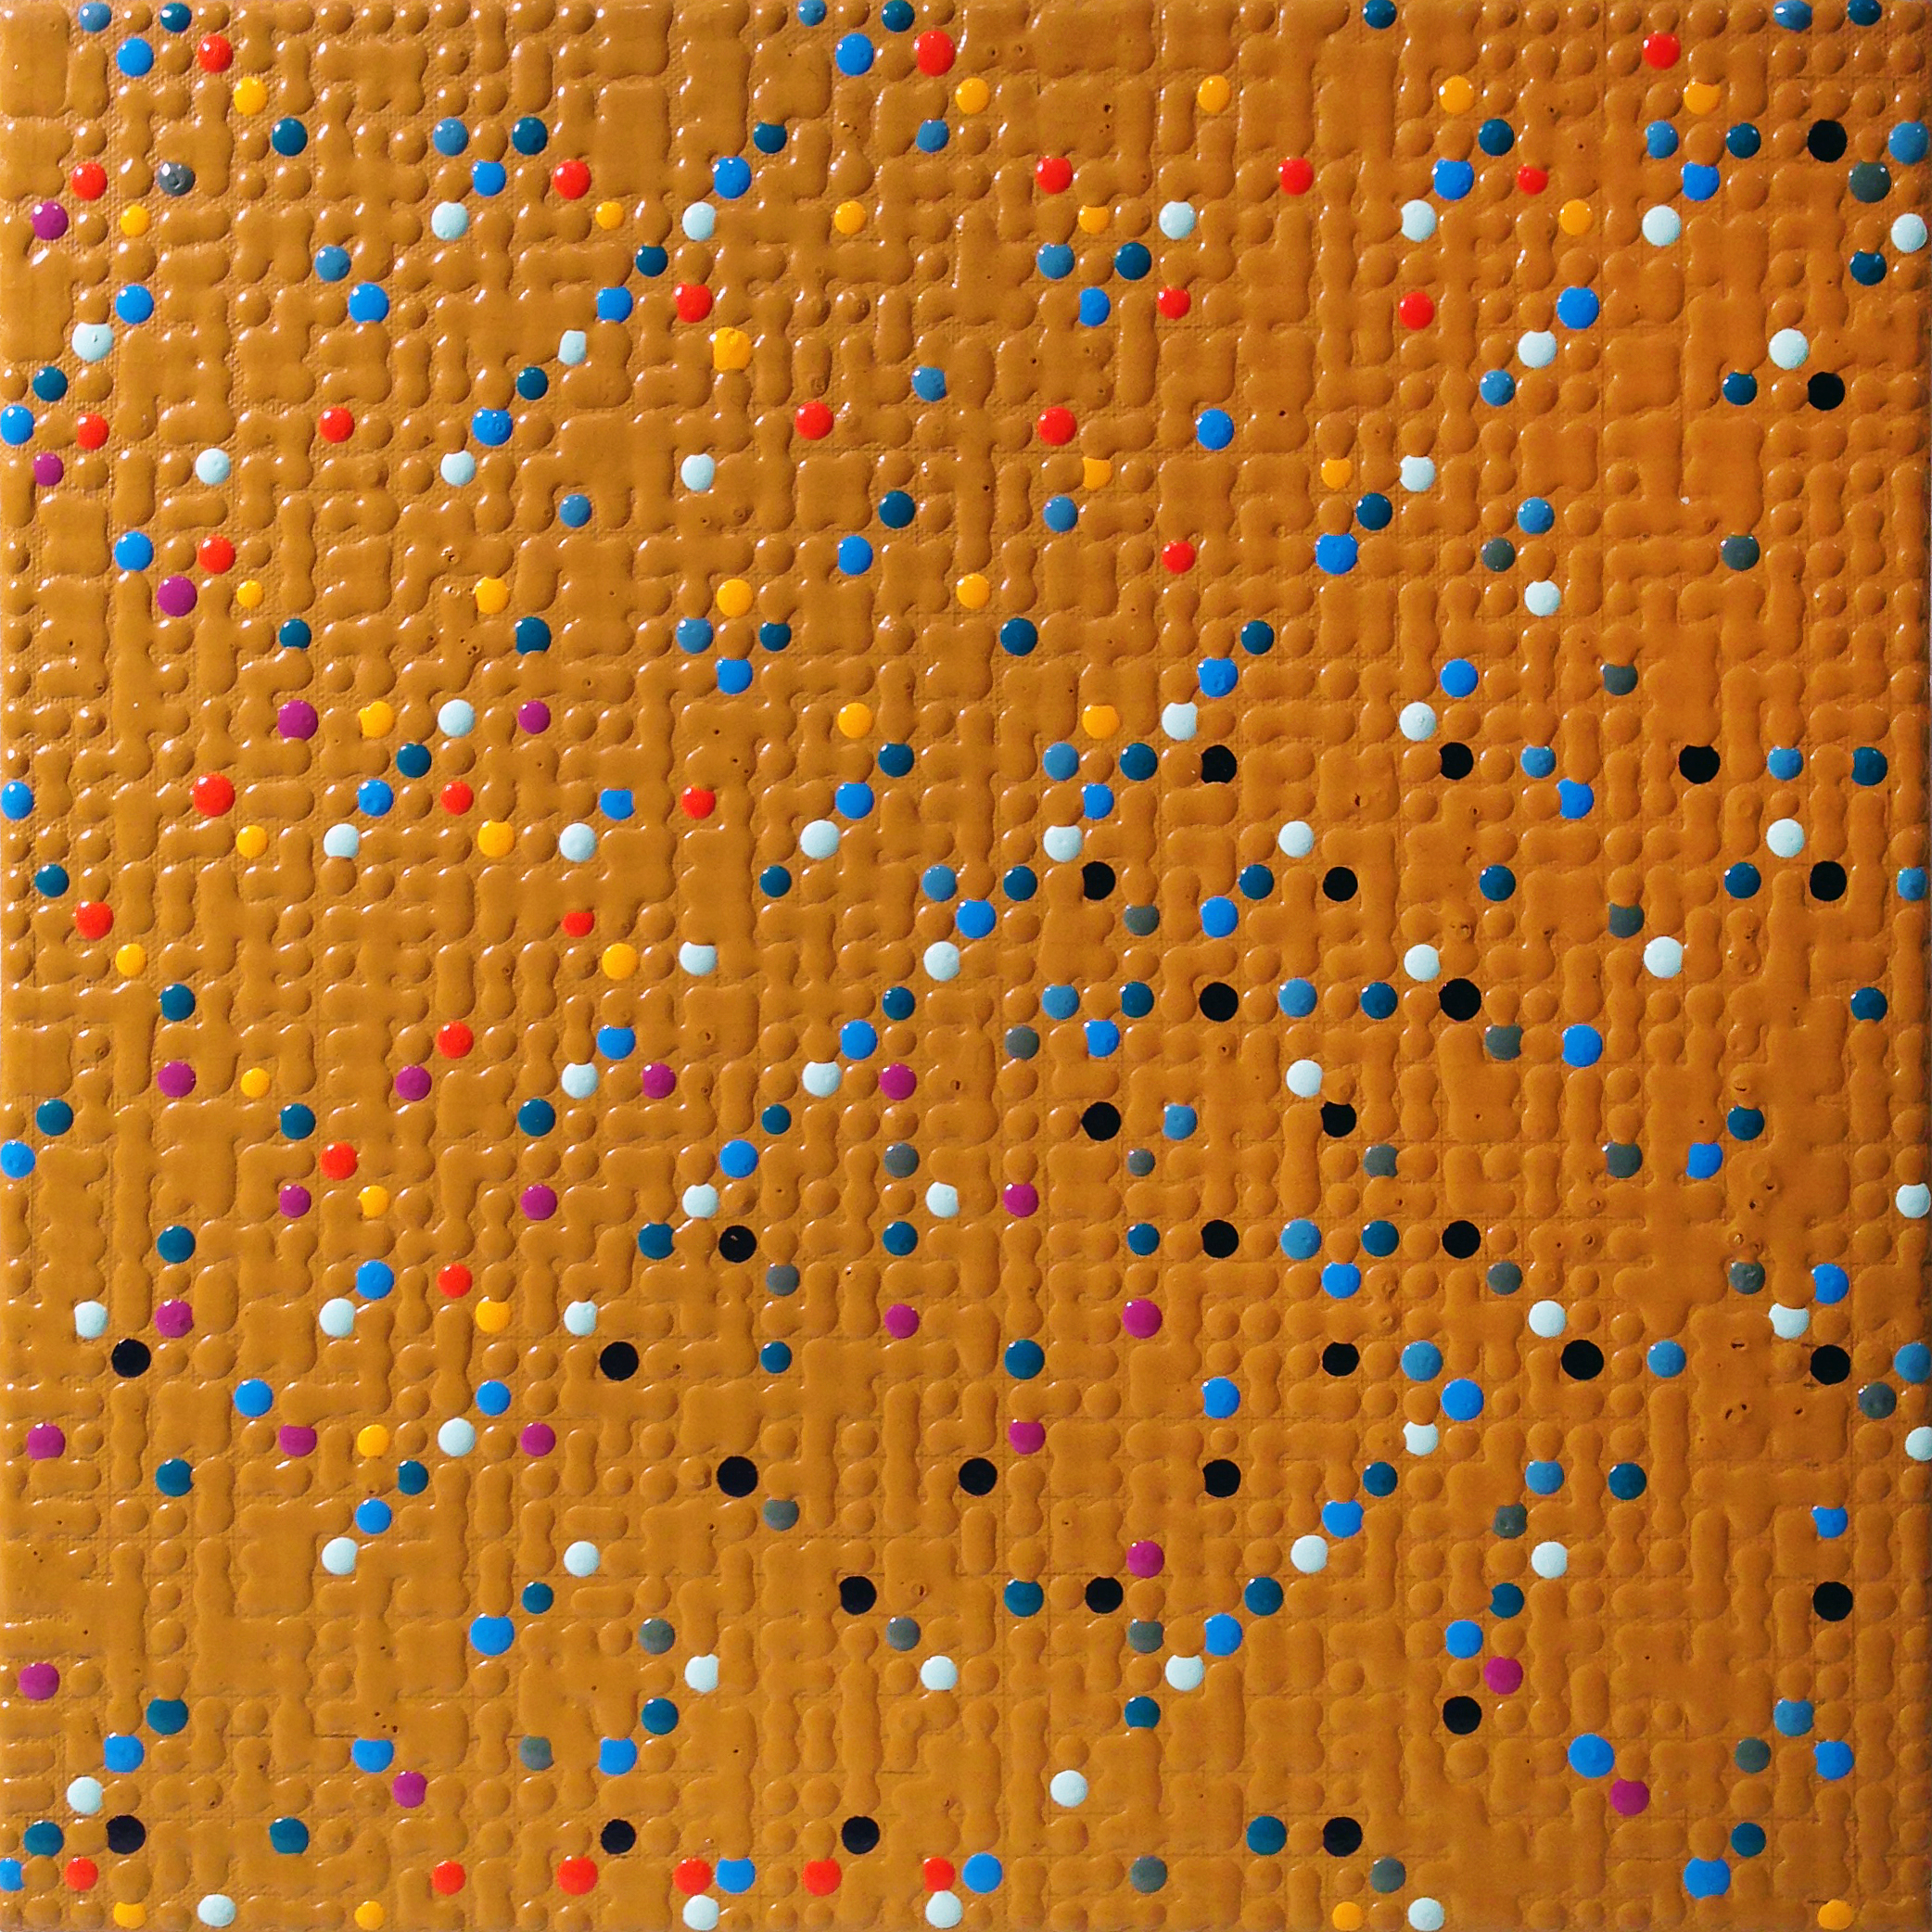 Primary Array #17, acrylic on canvas, 2008, 12 x 12in | 30 x 30cm